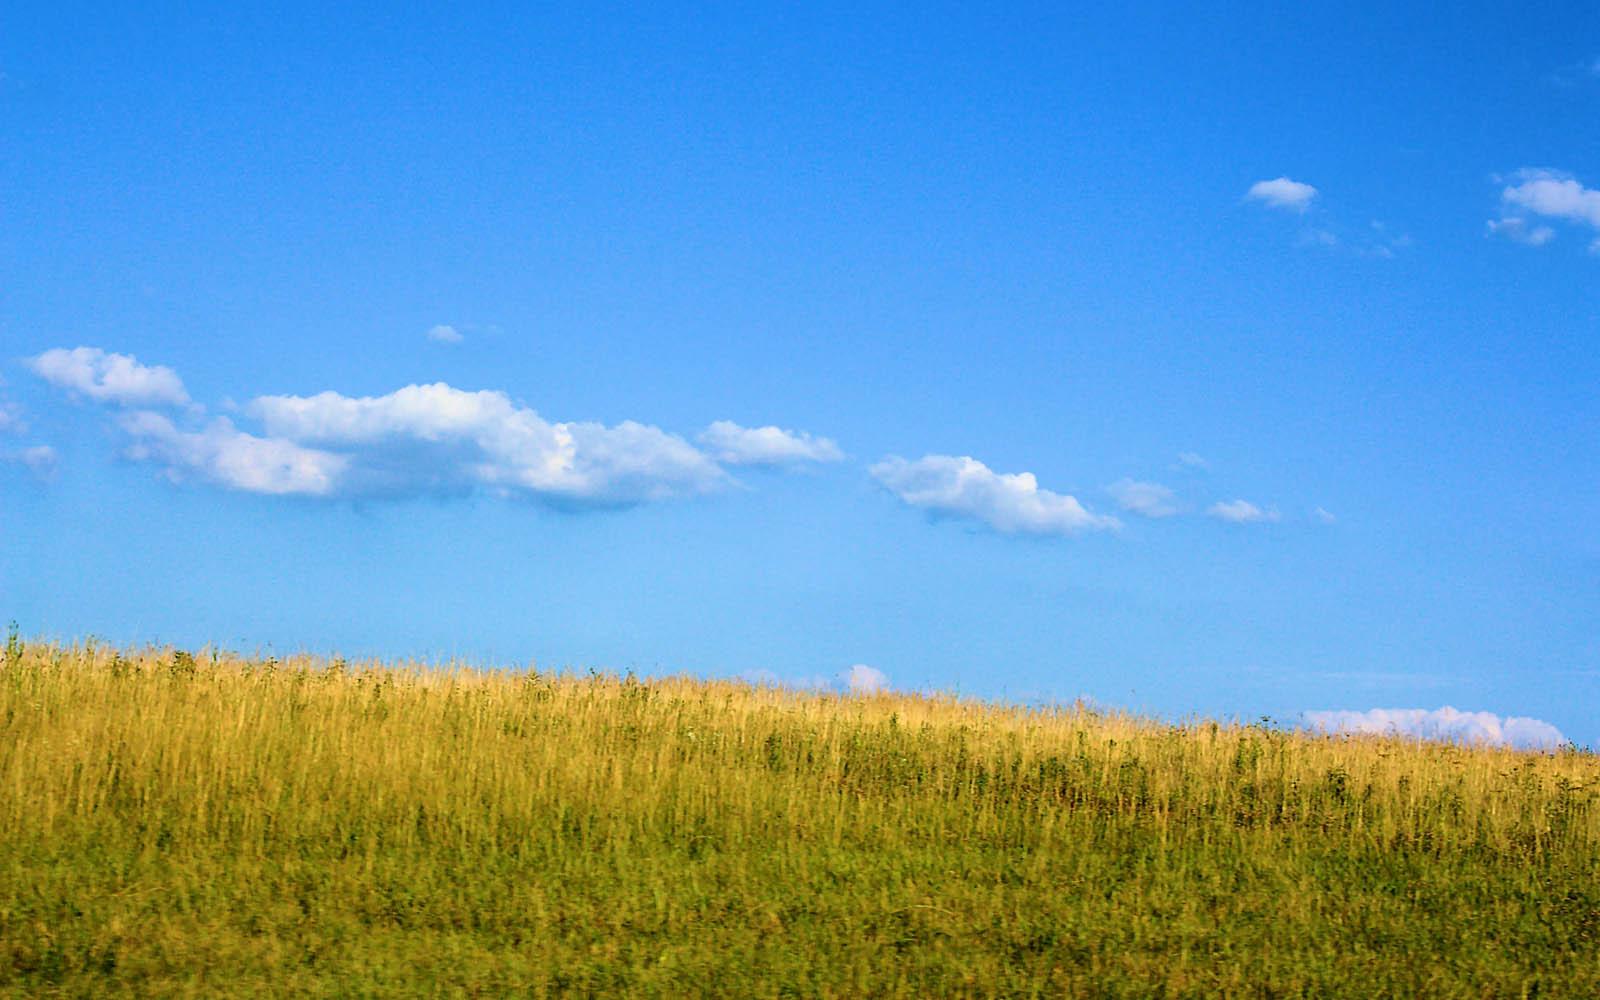 pasture wallpaper - photo #31